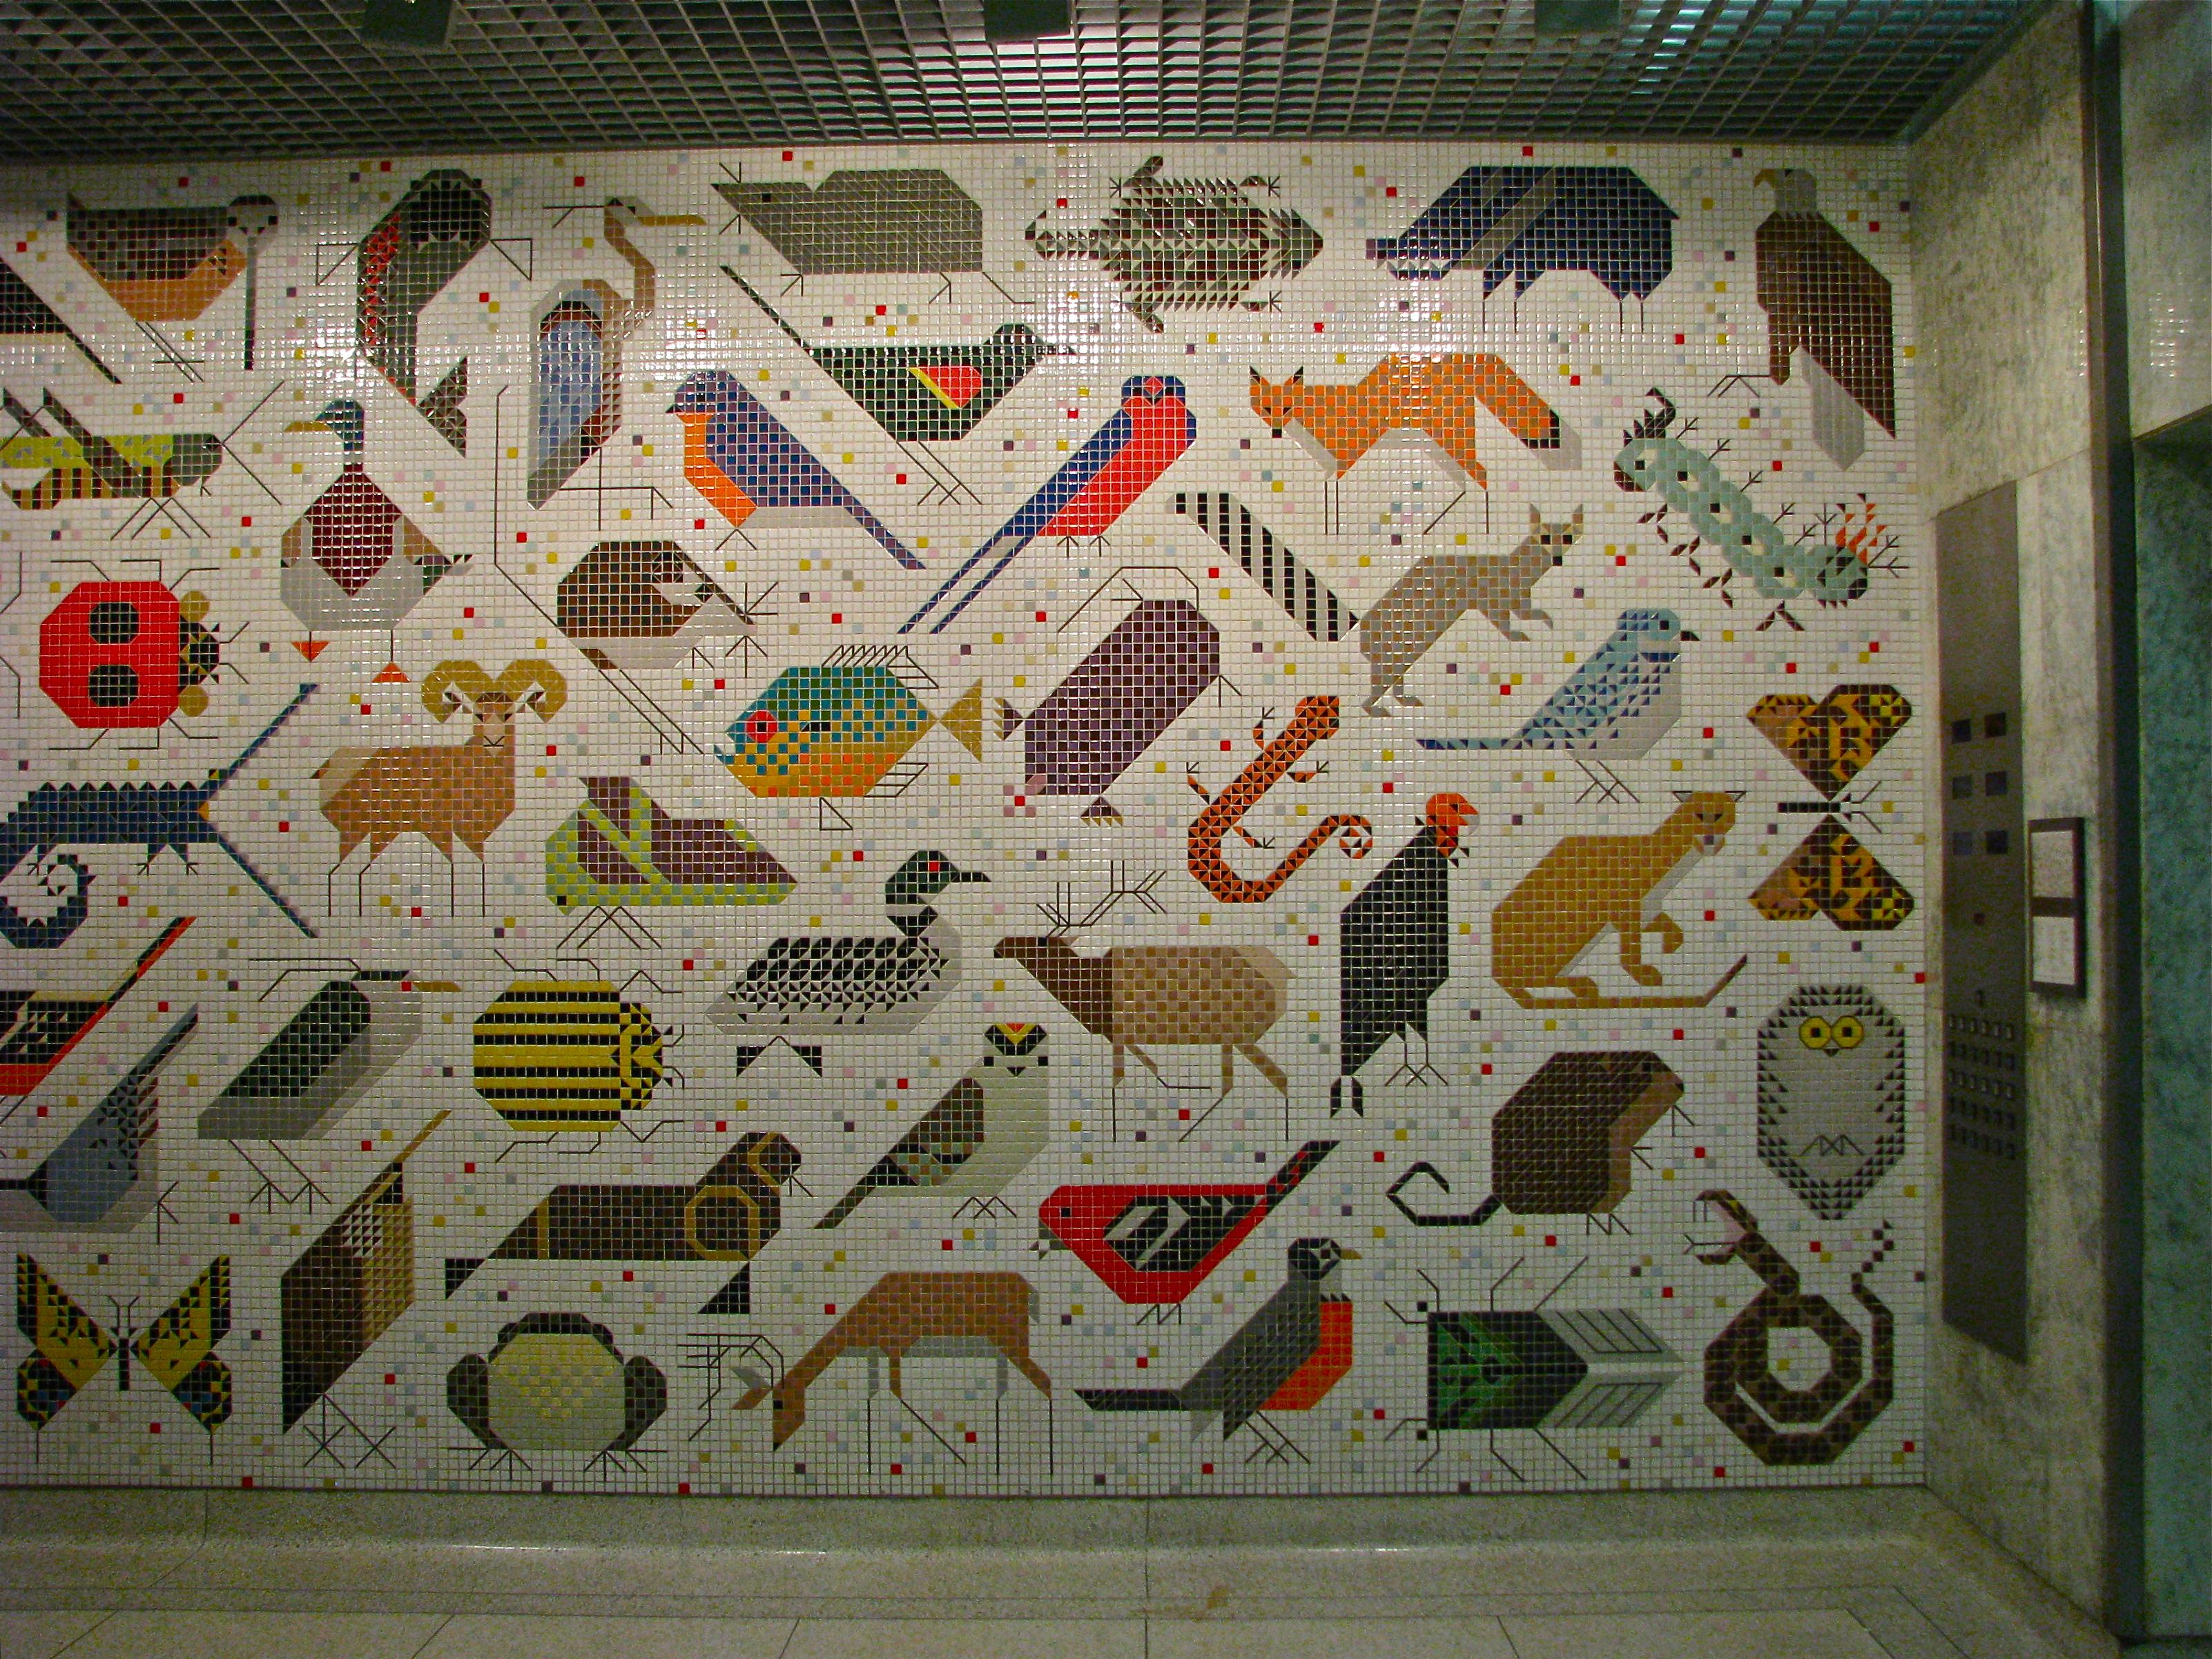 charley harper mosaic john weld peck federal building